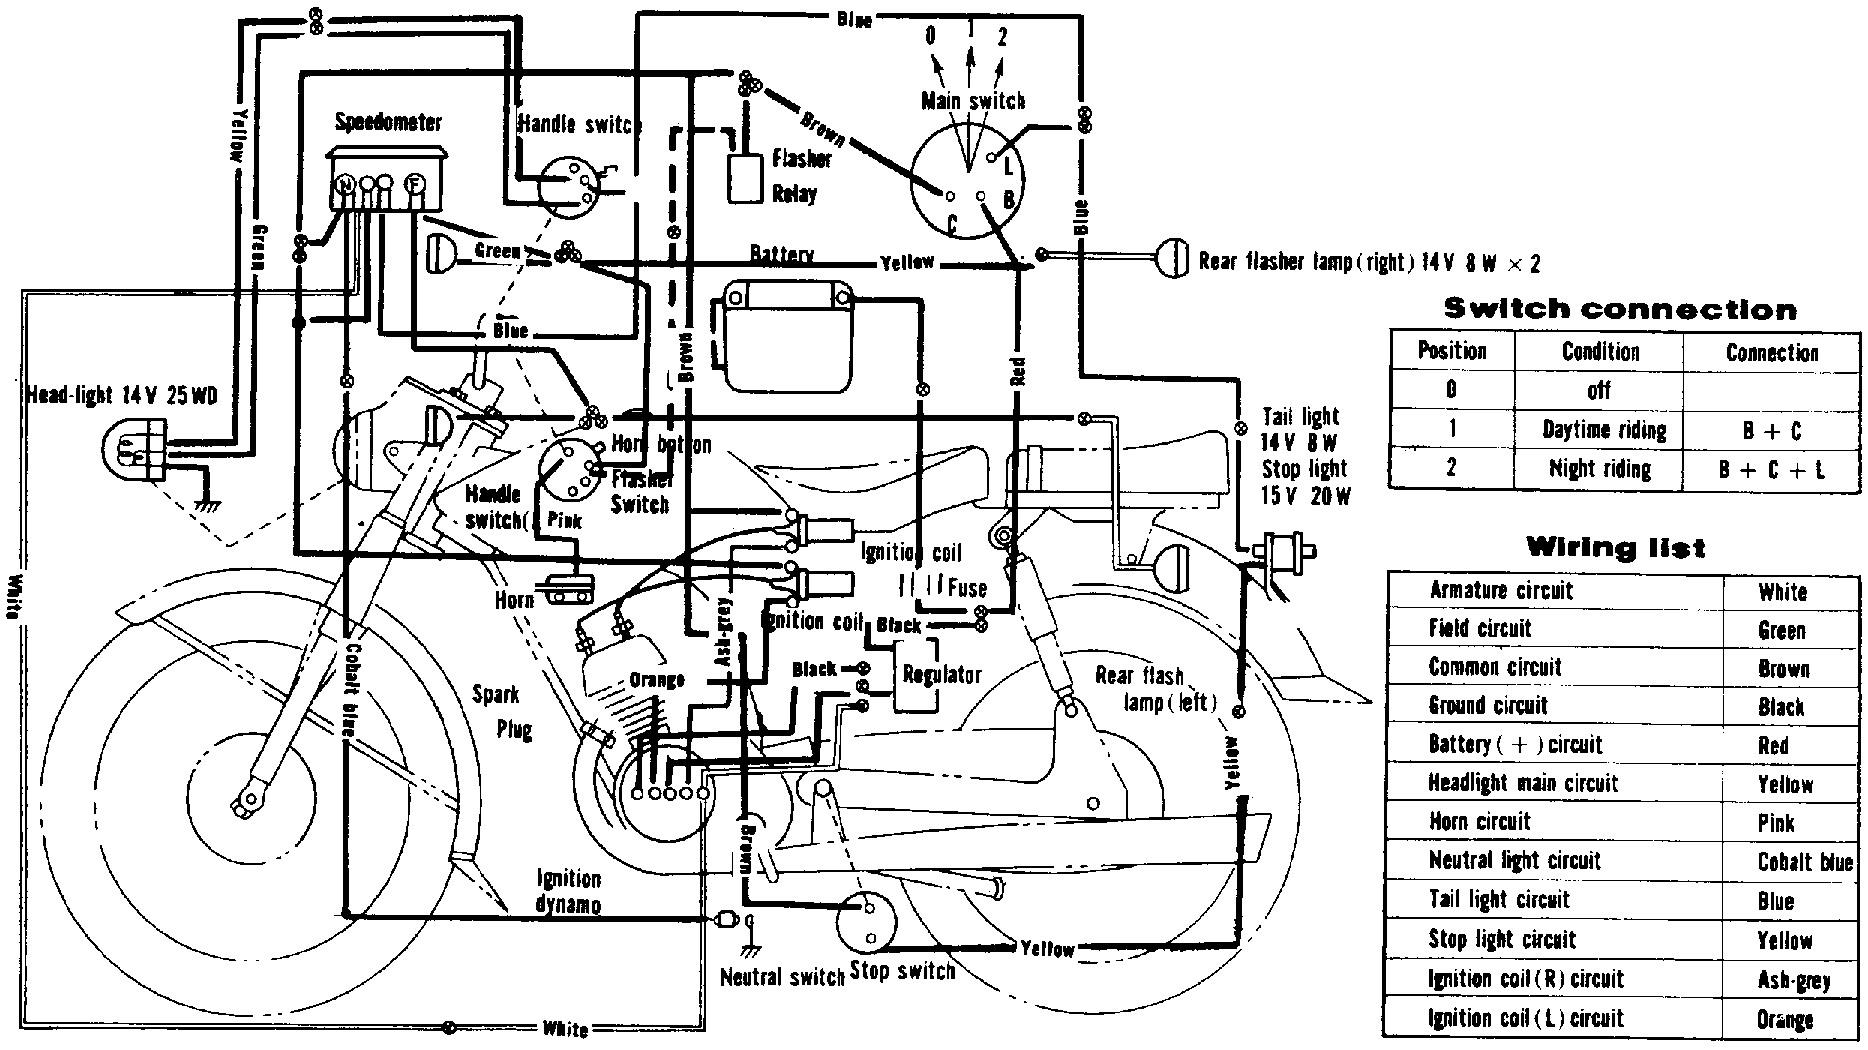 medium resolution of yamaha engine schematics wiring diagram paper1971 yamaha engine diagram 19